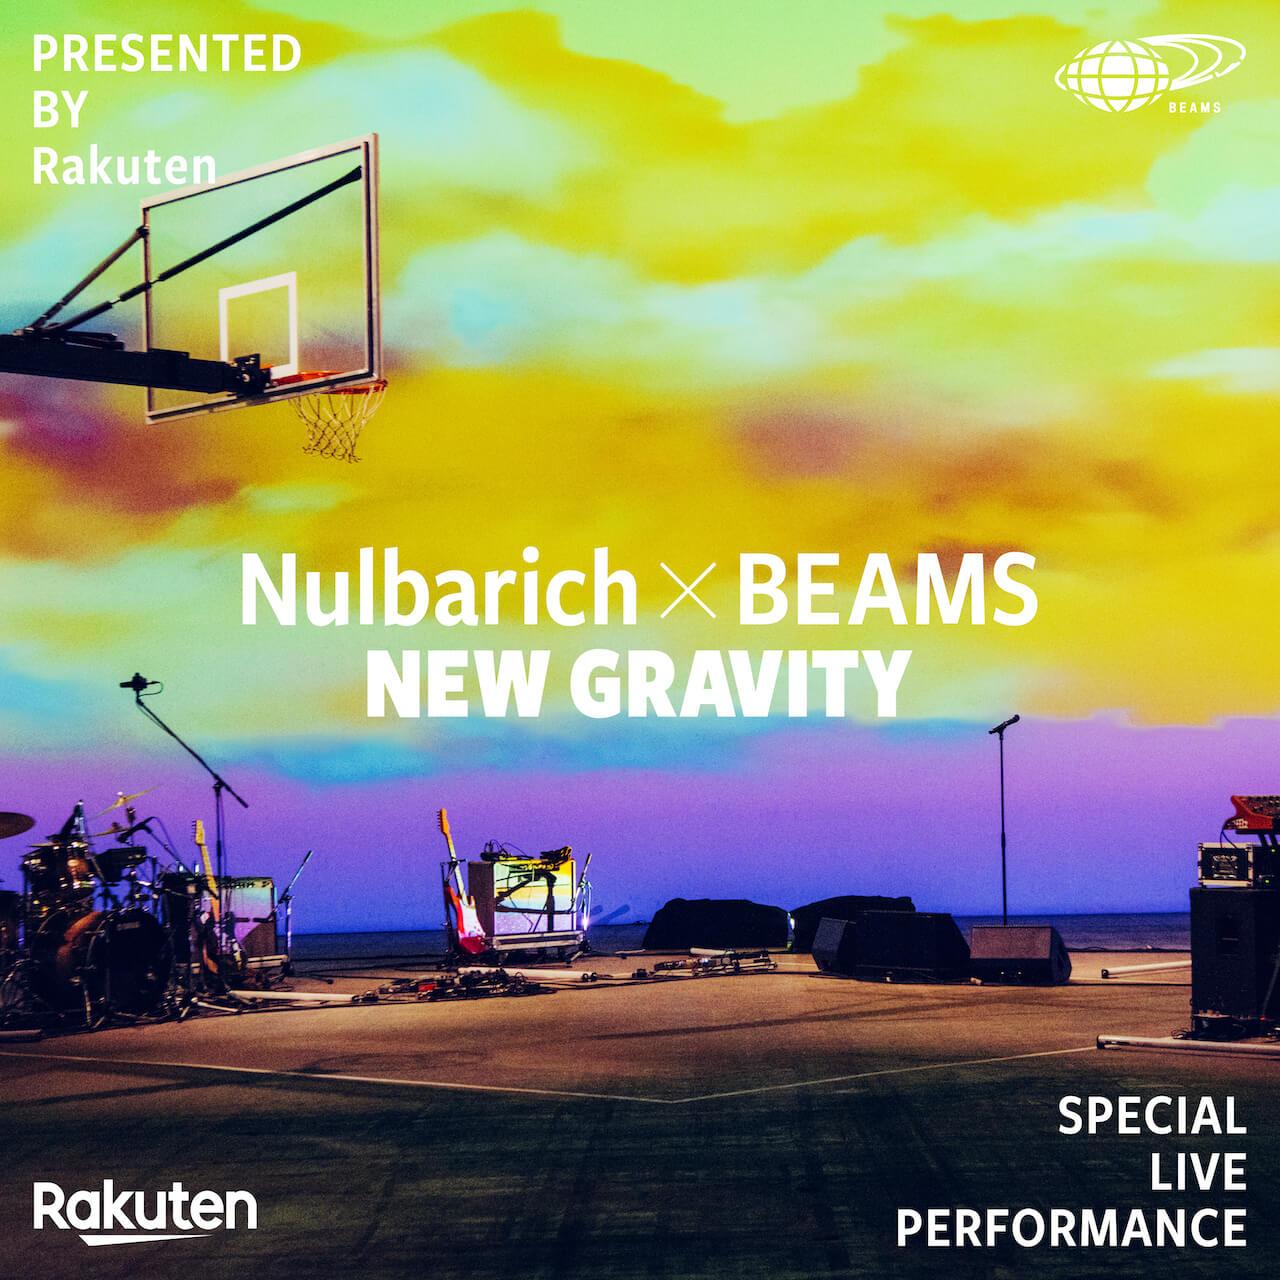 Nulbarich×BEAMSによるスペシャルライブ動画を配信|ライブ演出のアートワークはYOSHIROTTEN music210414-nulbarich-beams-2